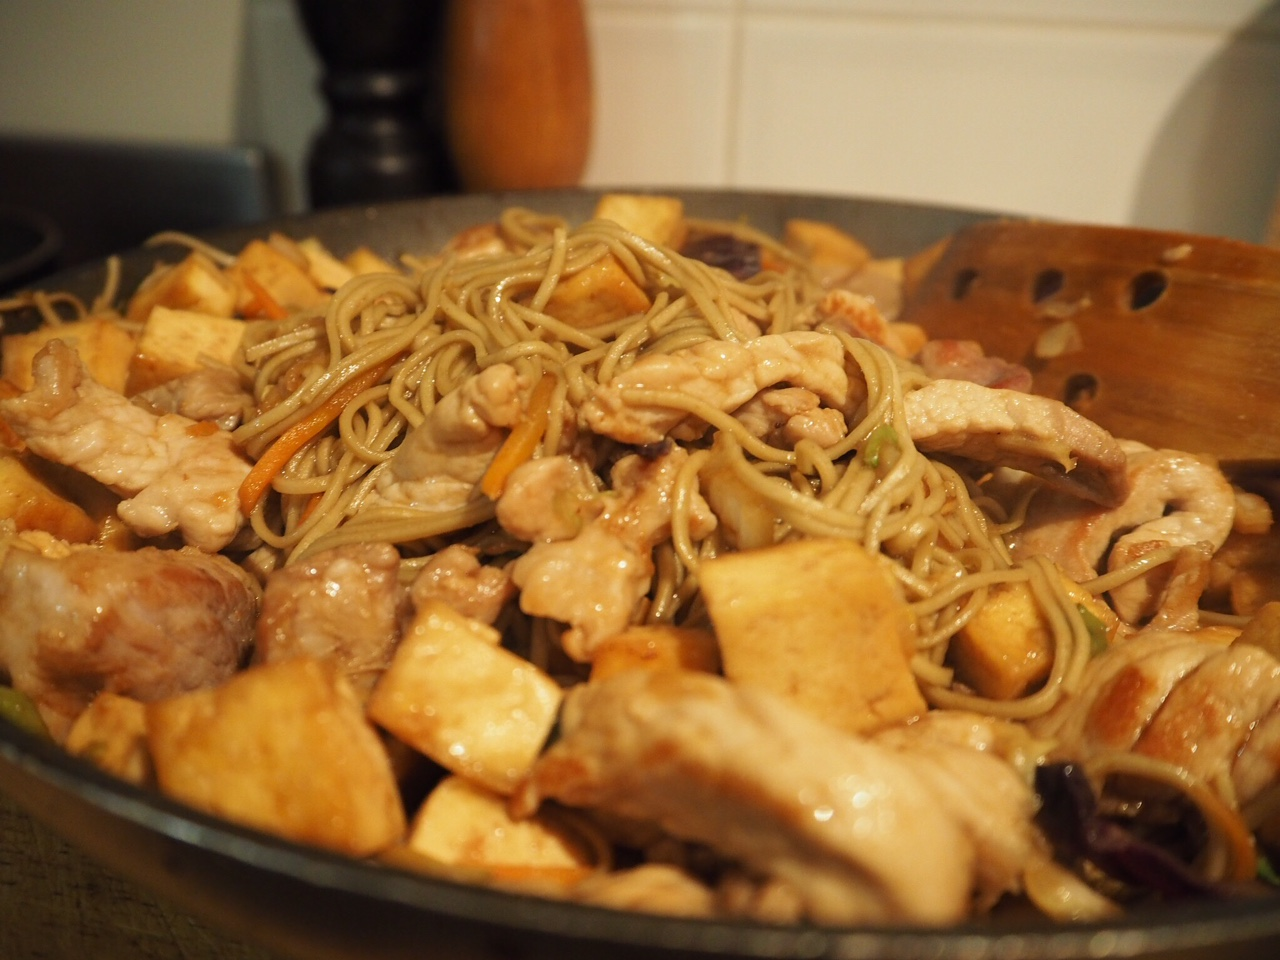 Gluten Free Pork, Tofu and Soba Noodle Stir Fry